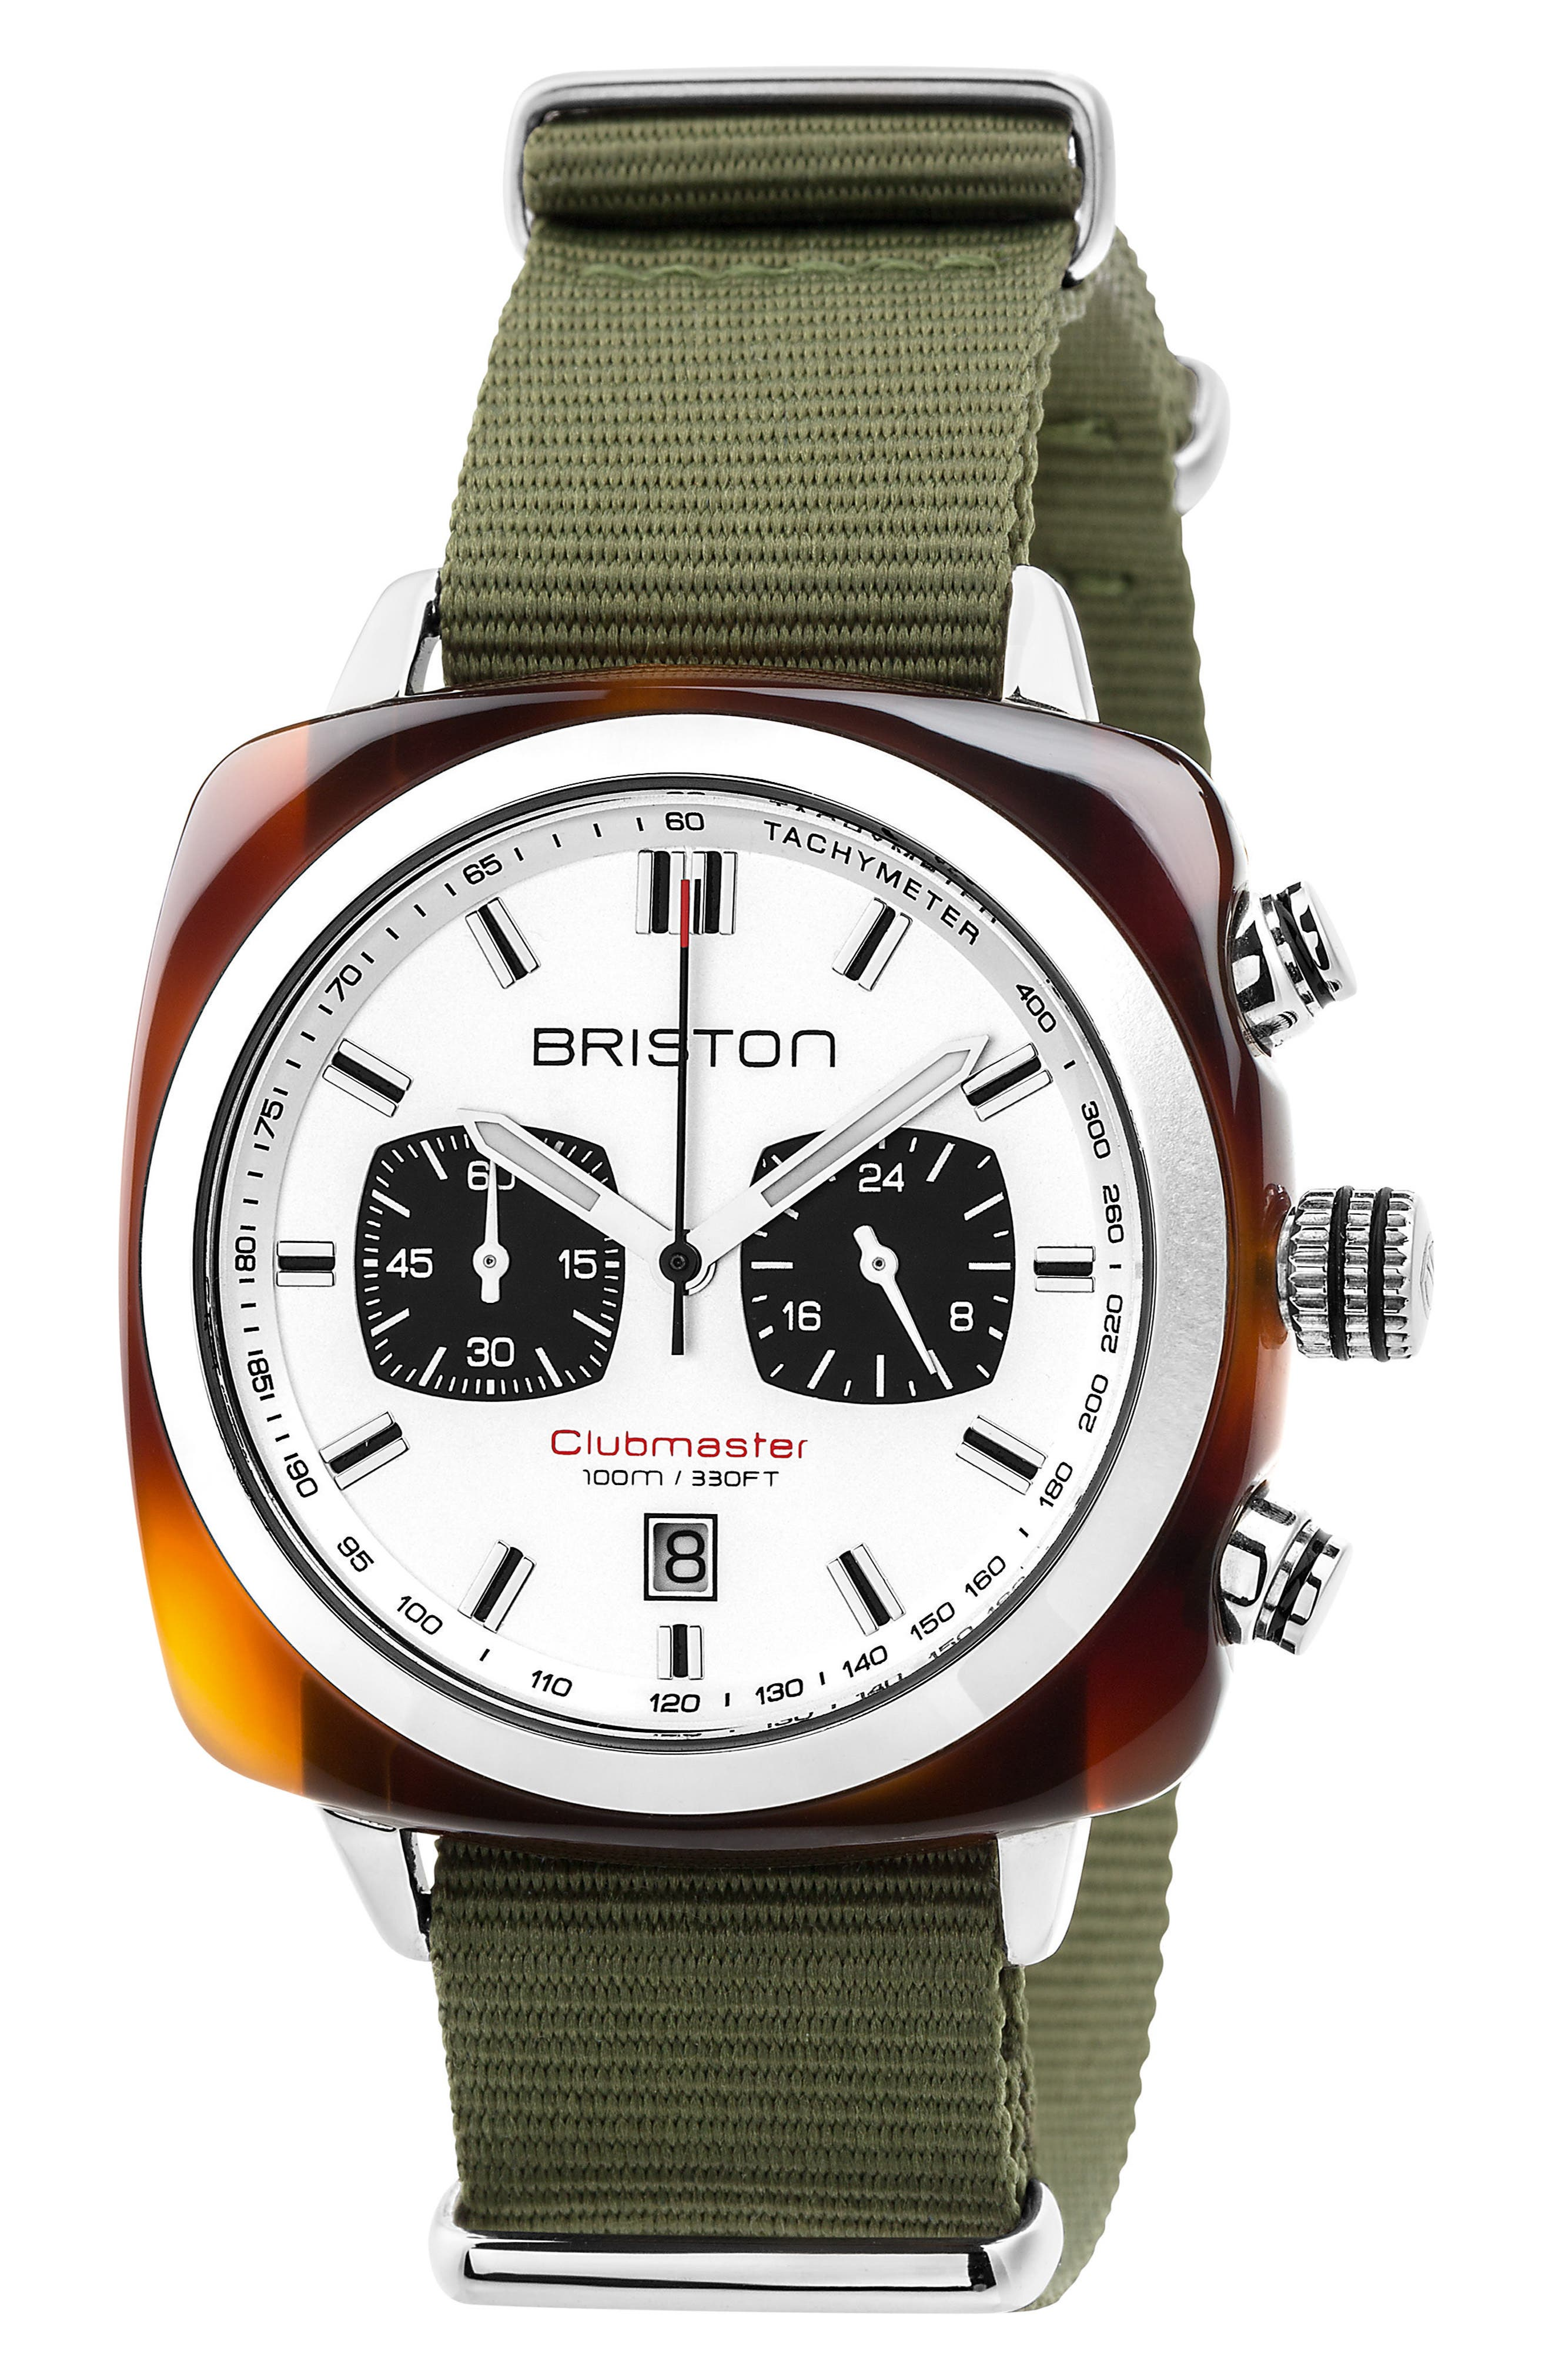 Main Image - Briston Watches Clubmaster Sport Chronograph Nylon Strap Watch, 42mm